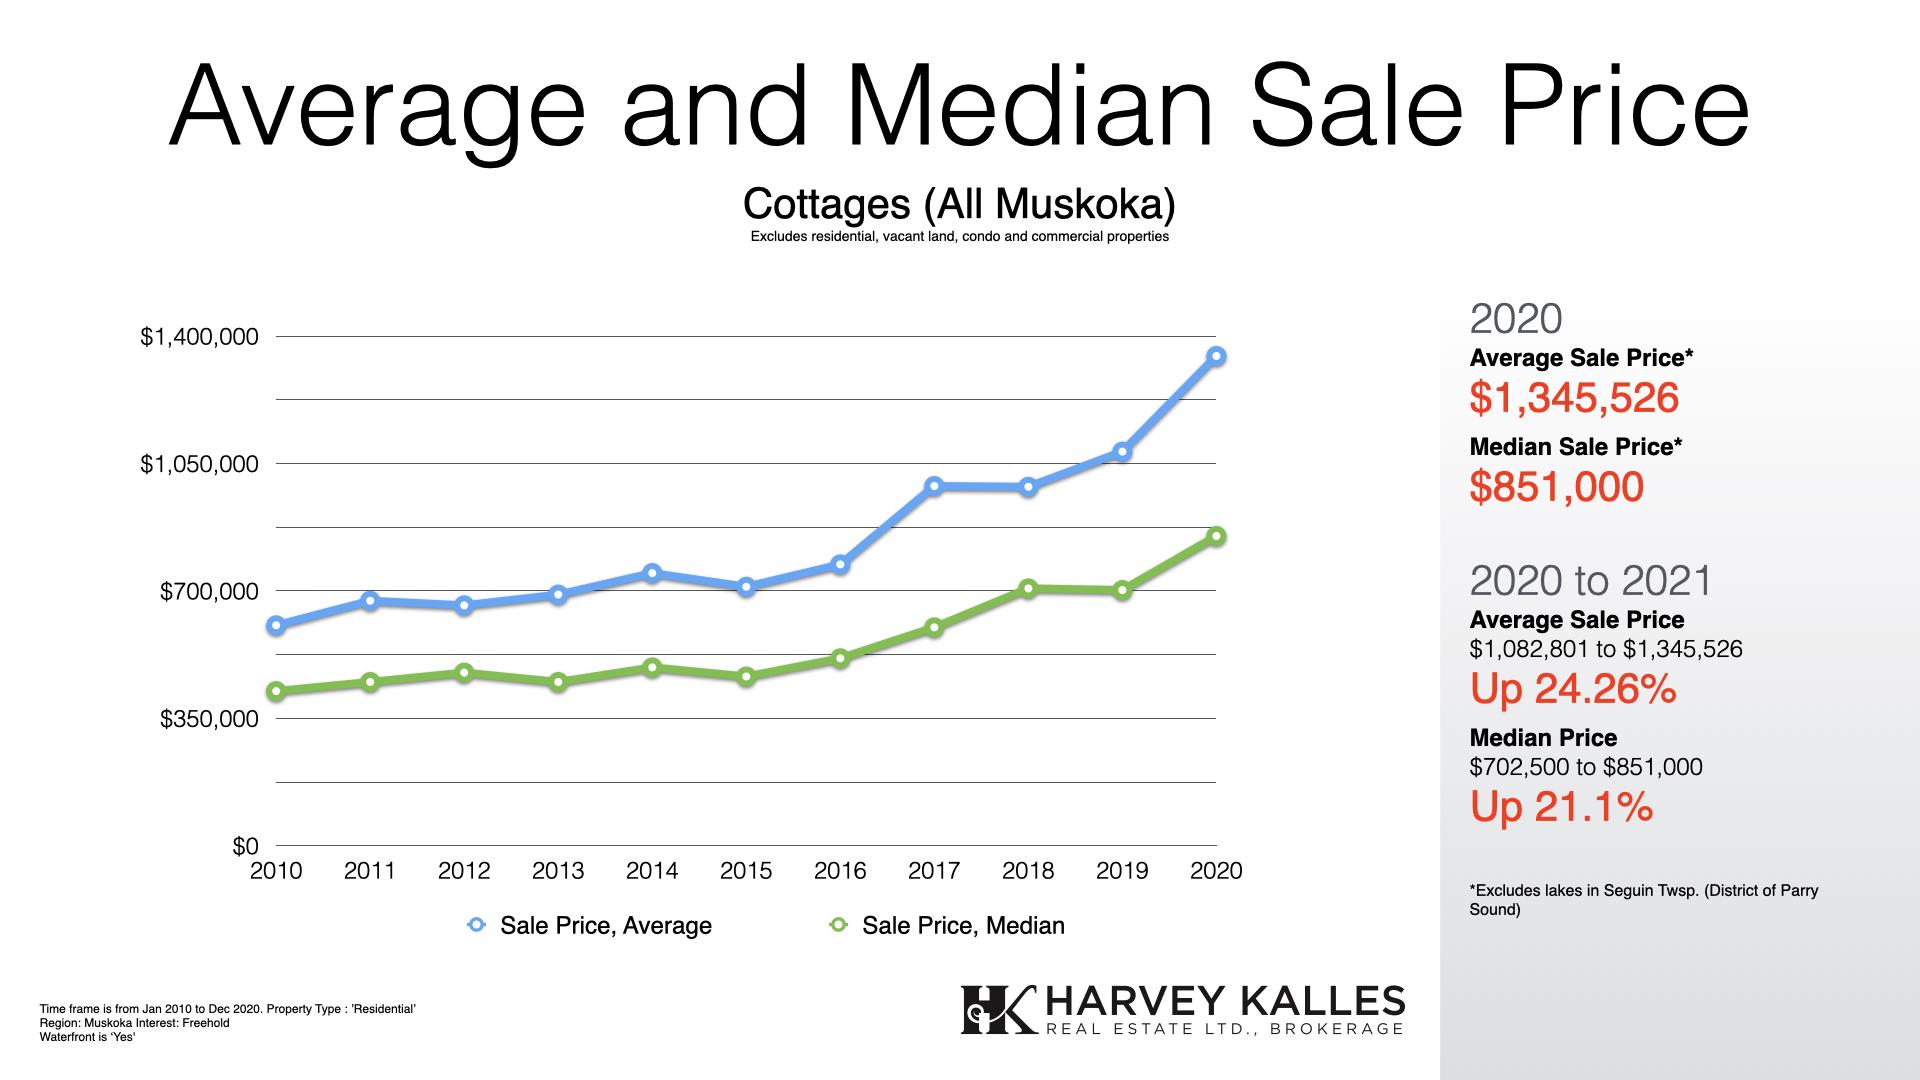 muskoka-cottage-real-estate-average-median-sale-price